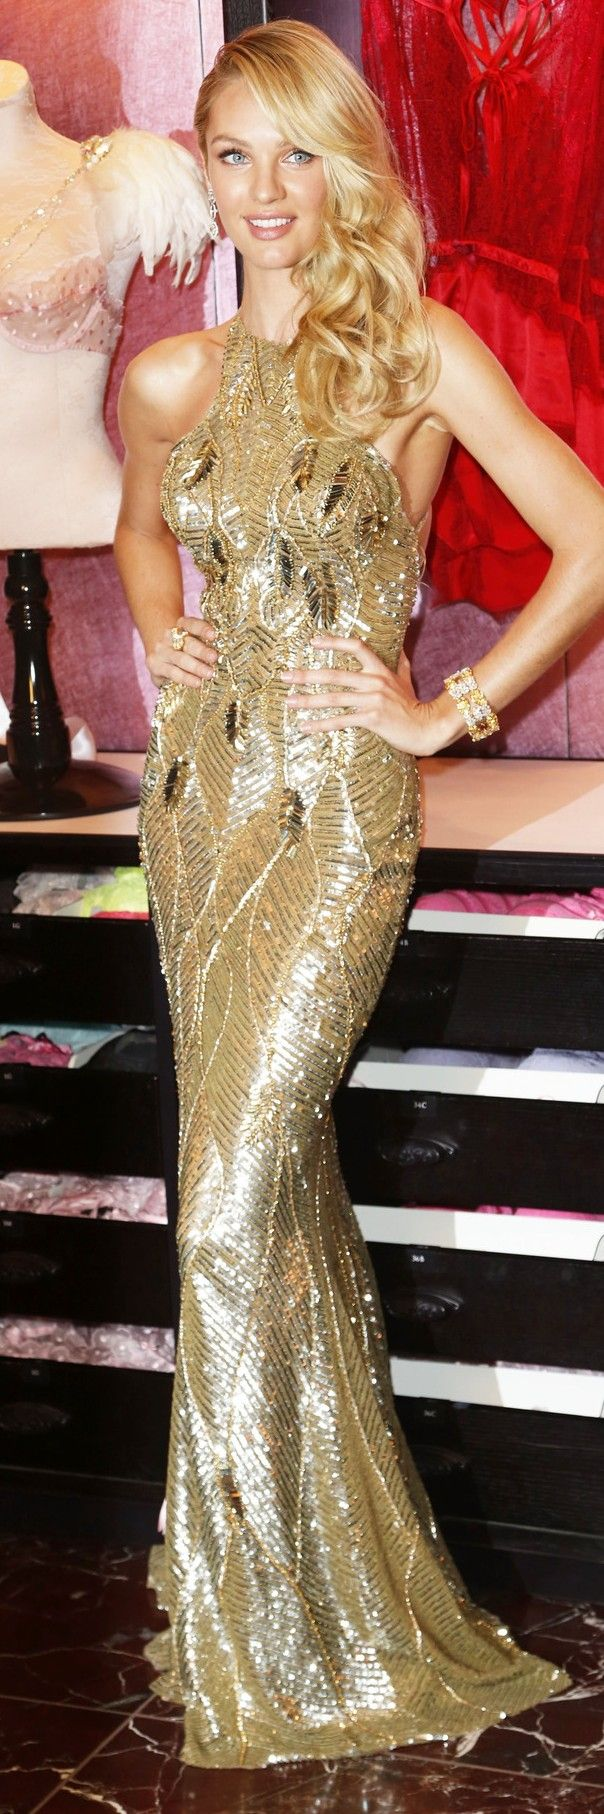 White and Gold Wedding. Gold Bridesmaid Dress. Elegant and Glamorous. Gold VS style